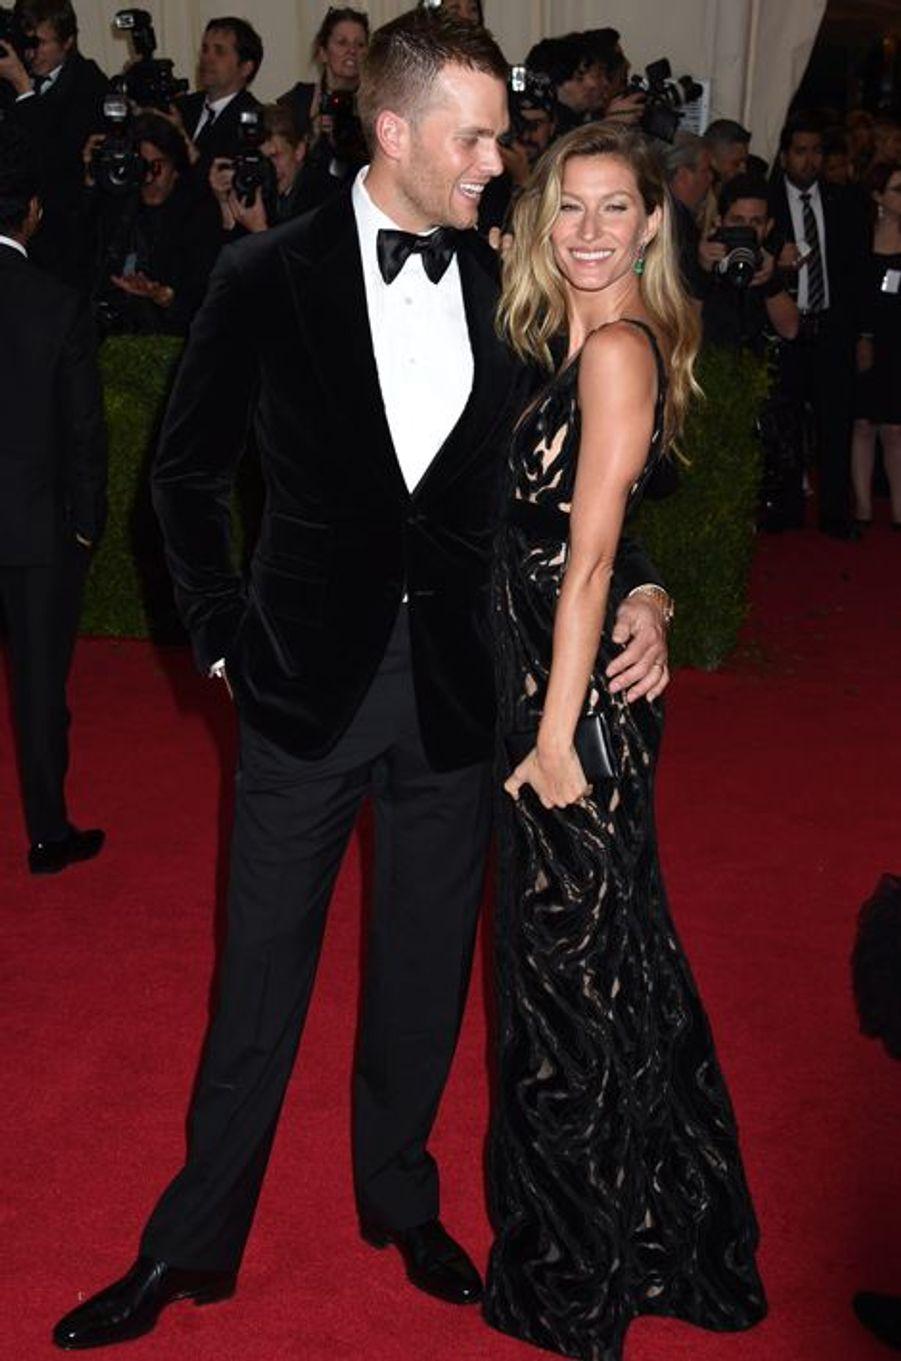 Tom Brady et Gisele Bündchen (en Balenciaga)